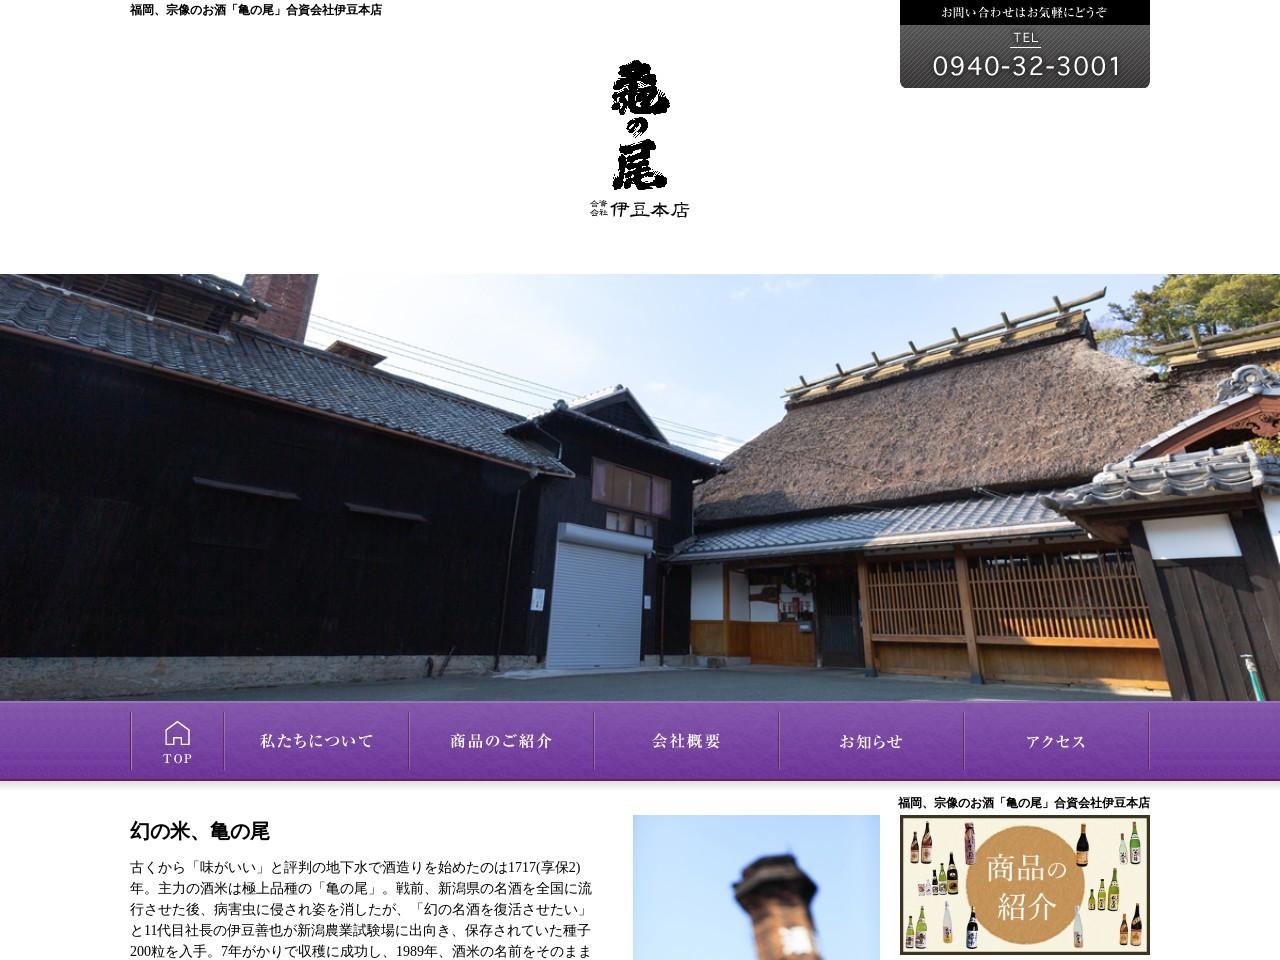 亀の尾 伊豆本店